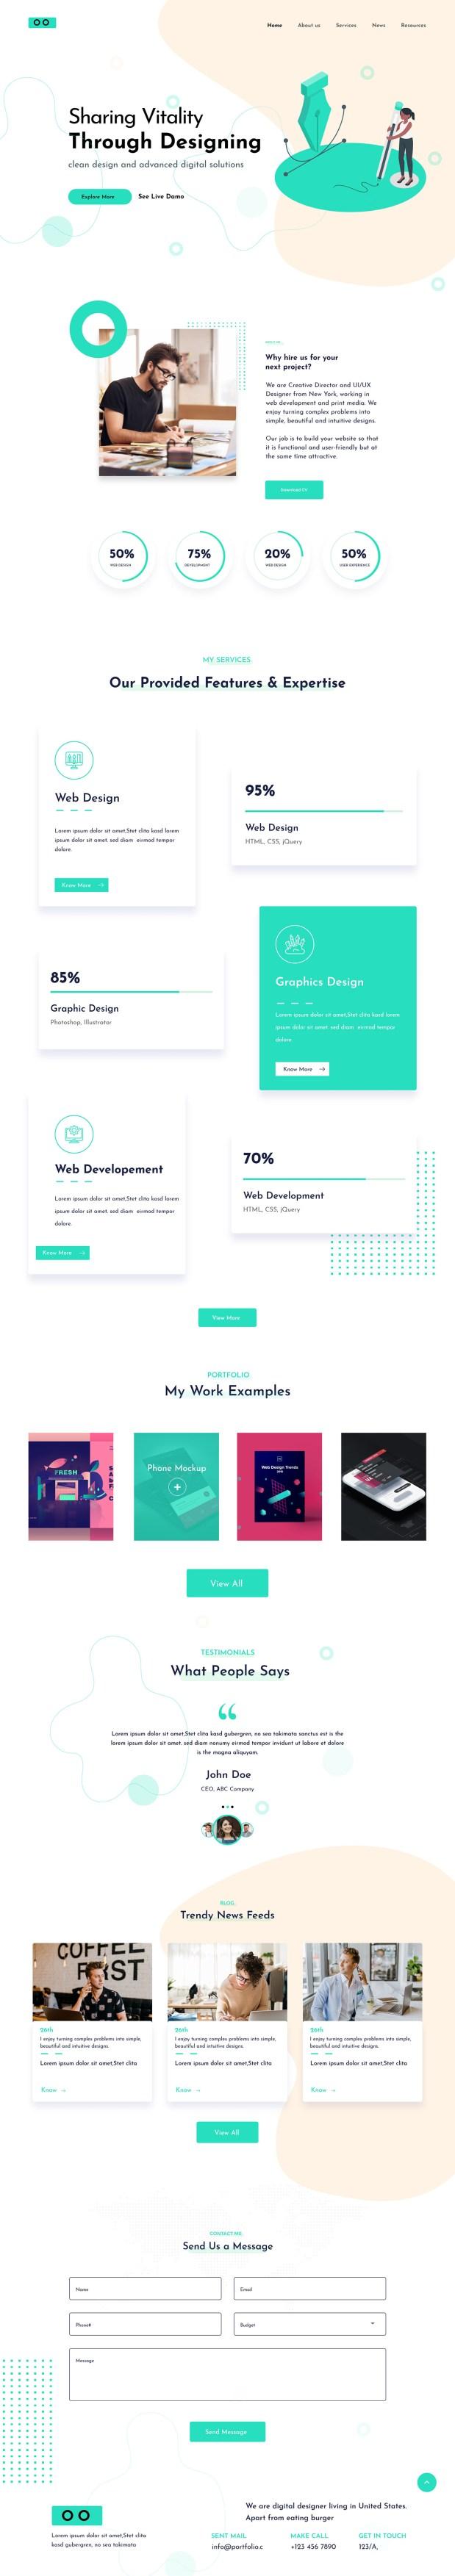 Free Agency Web Design for Adobe XD